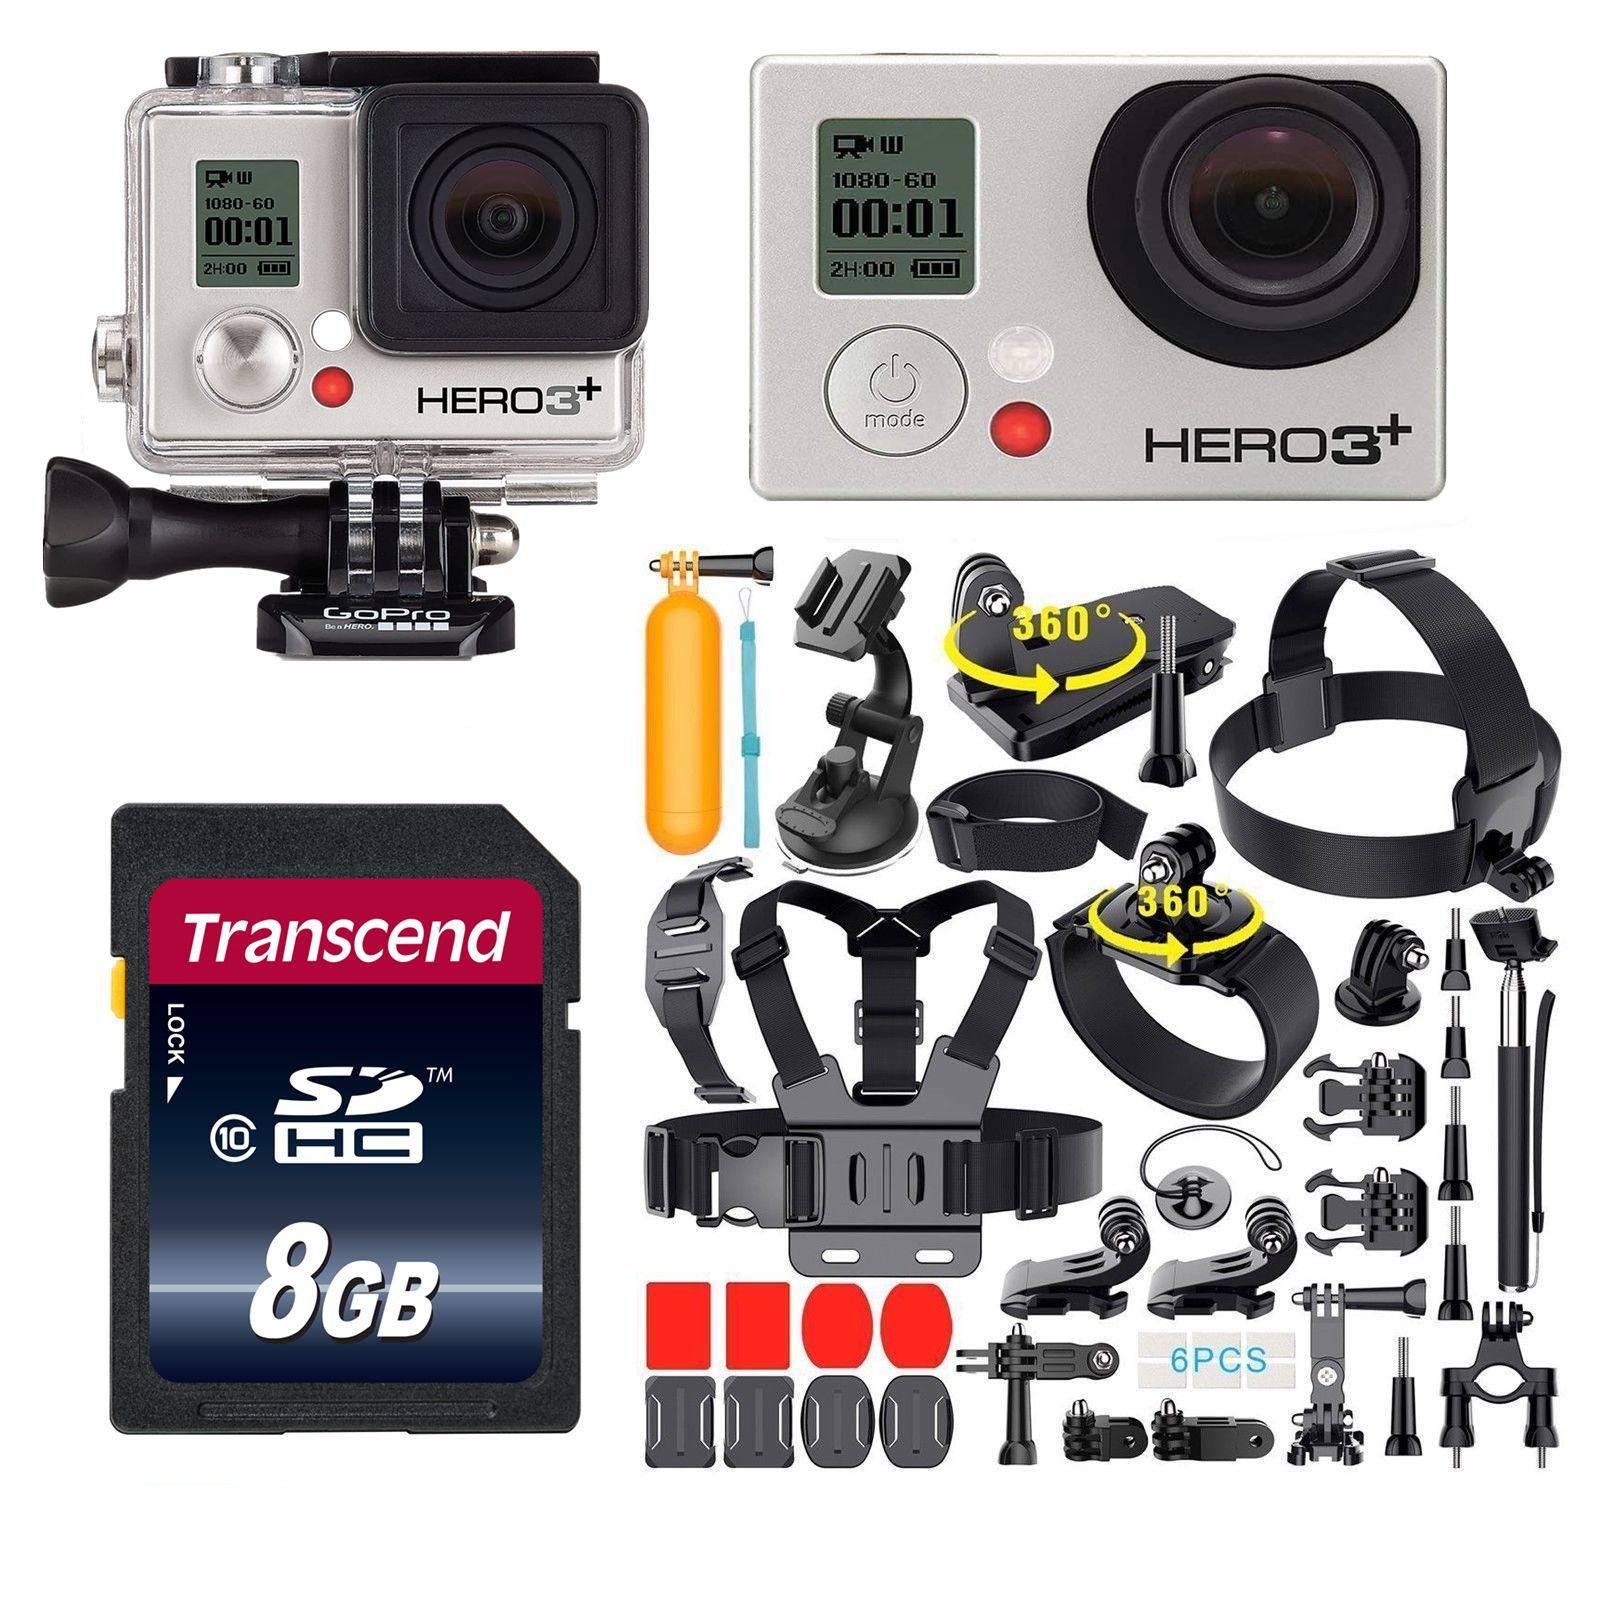 GoPro Hero3+ Black Edition Action Sport 4K Camera